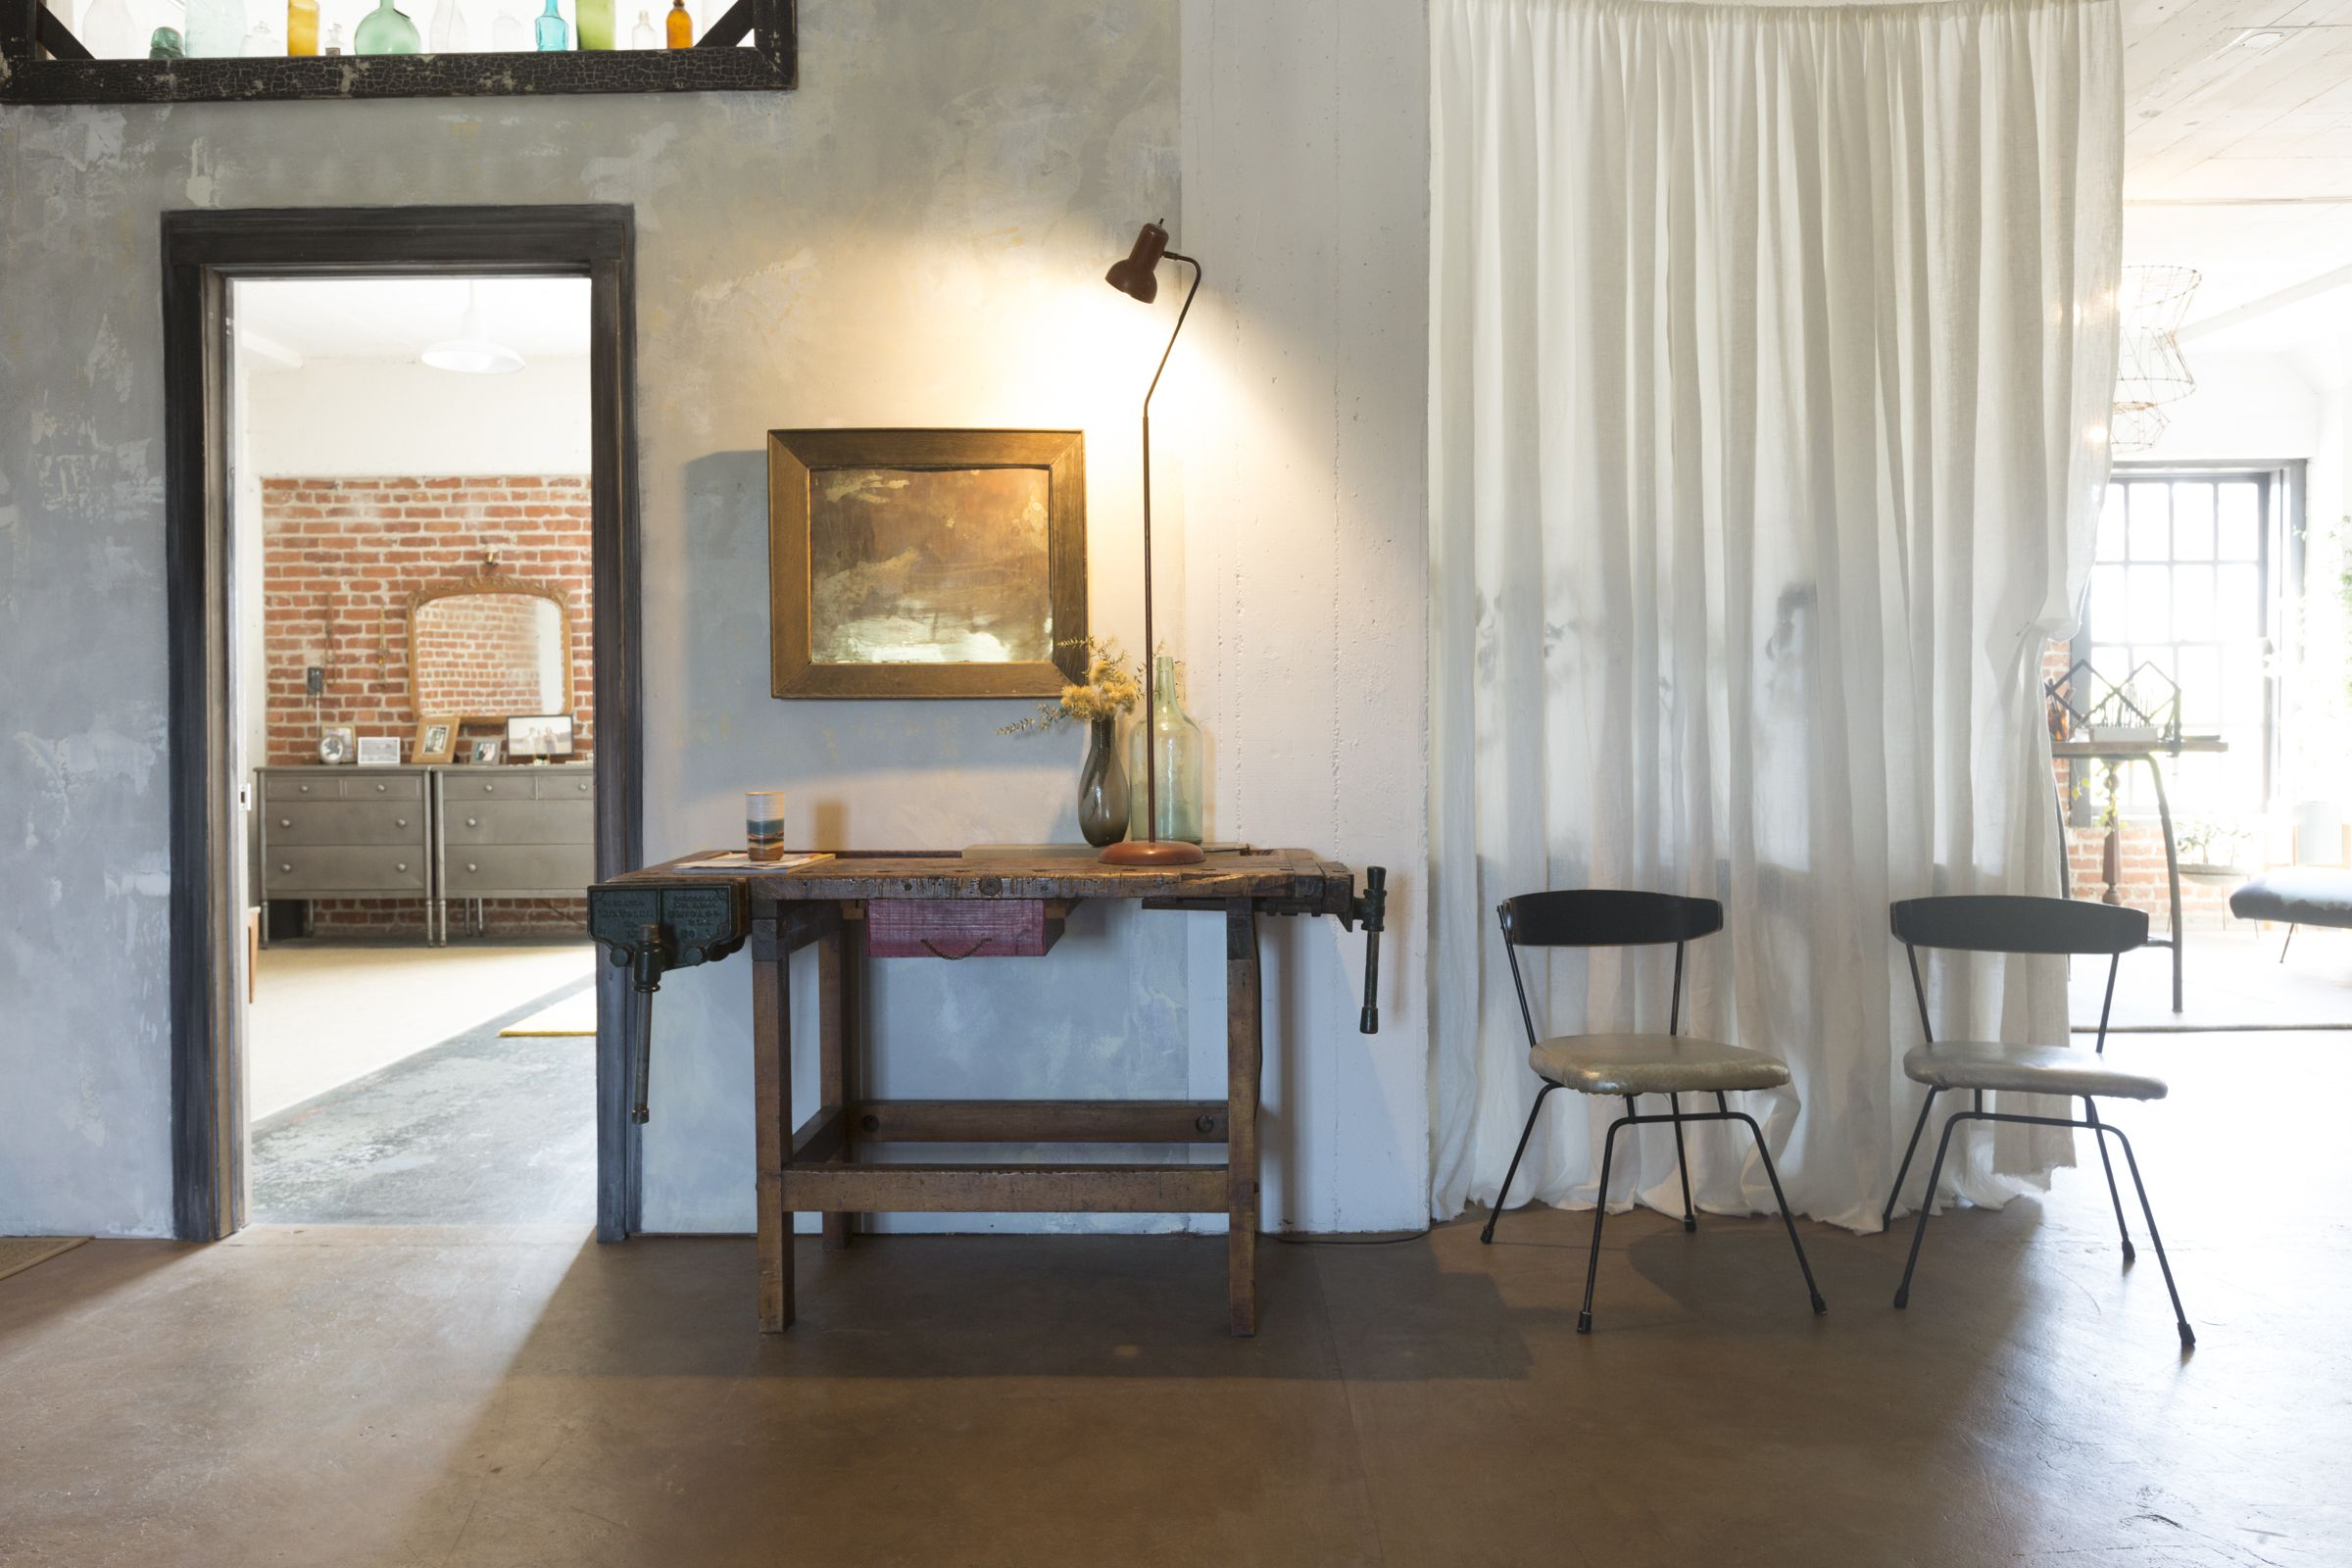 Sarah E Owen Studio Oakland Ca Interior Design Photographer Photo By Lauren Edith Andersen Via Laurenedith Laurenedithphoto